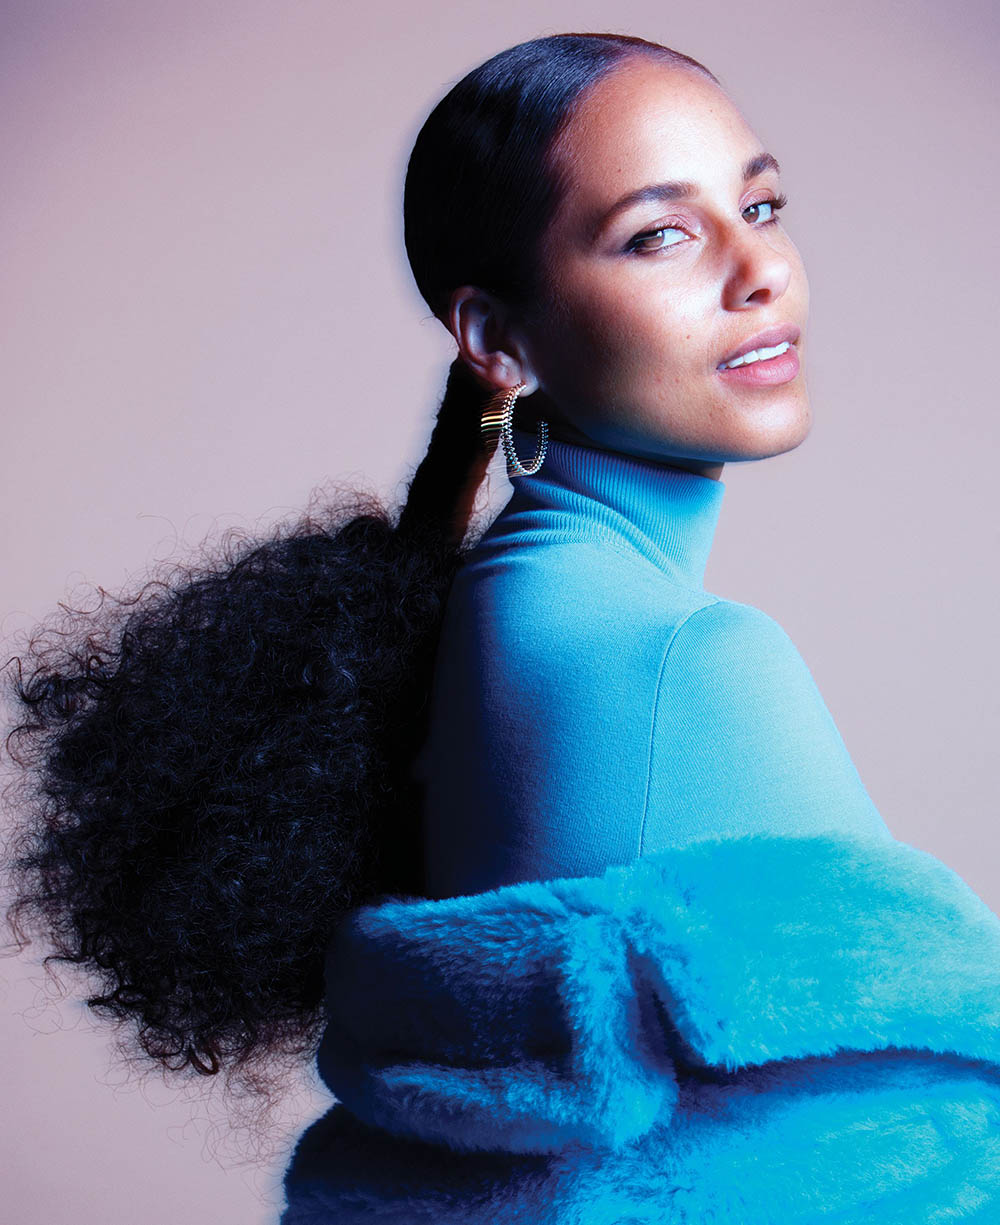 Alicia Keys and Christy Turlington cover Harper's Bazaar US September 2019 by Mario Sorrenti